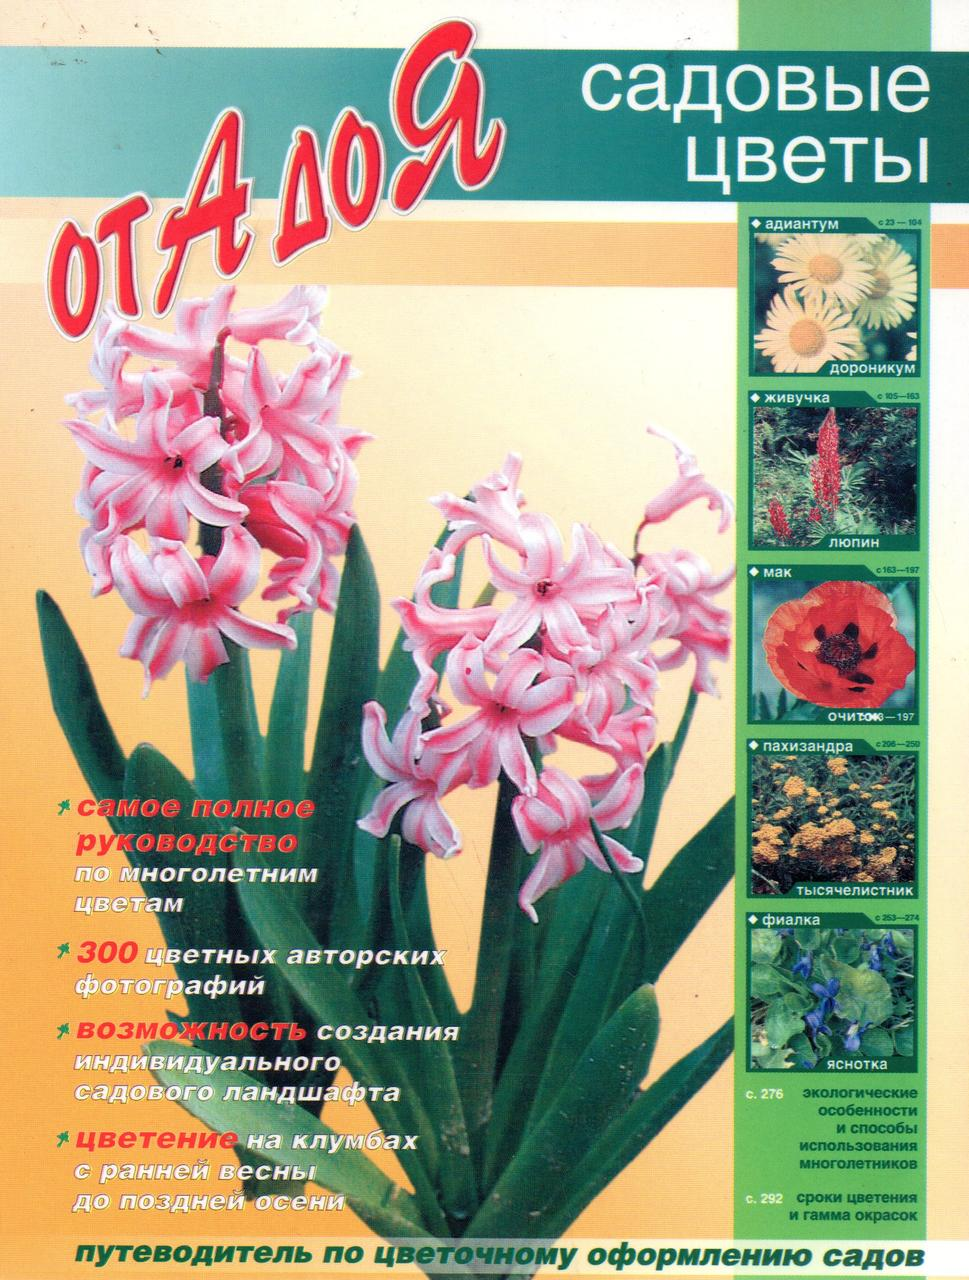 Садовые цветы от А до Я. Р. А. Карписонова, Т. С. Русинова, Л. П. Вавилова